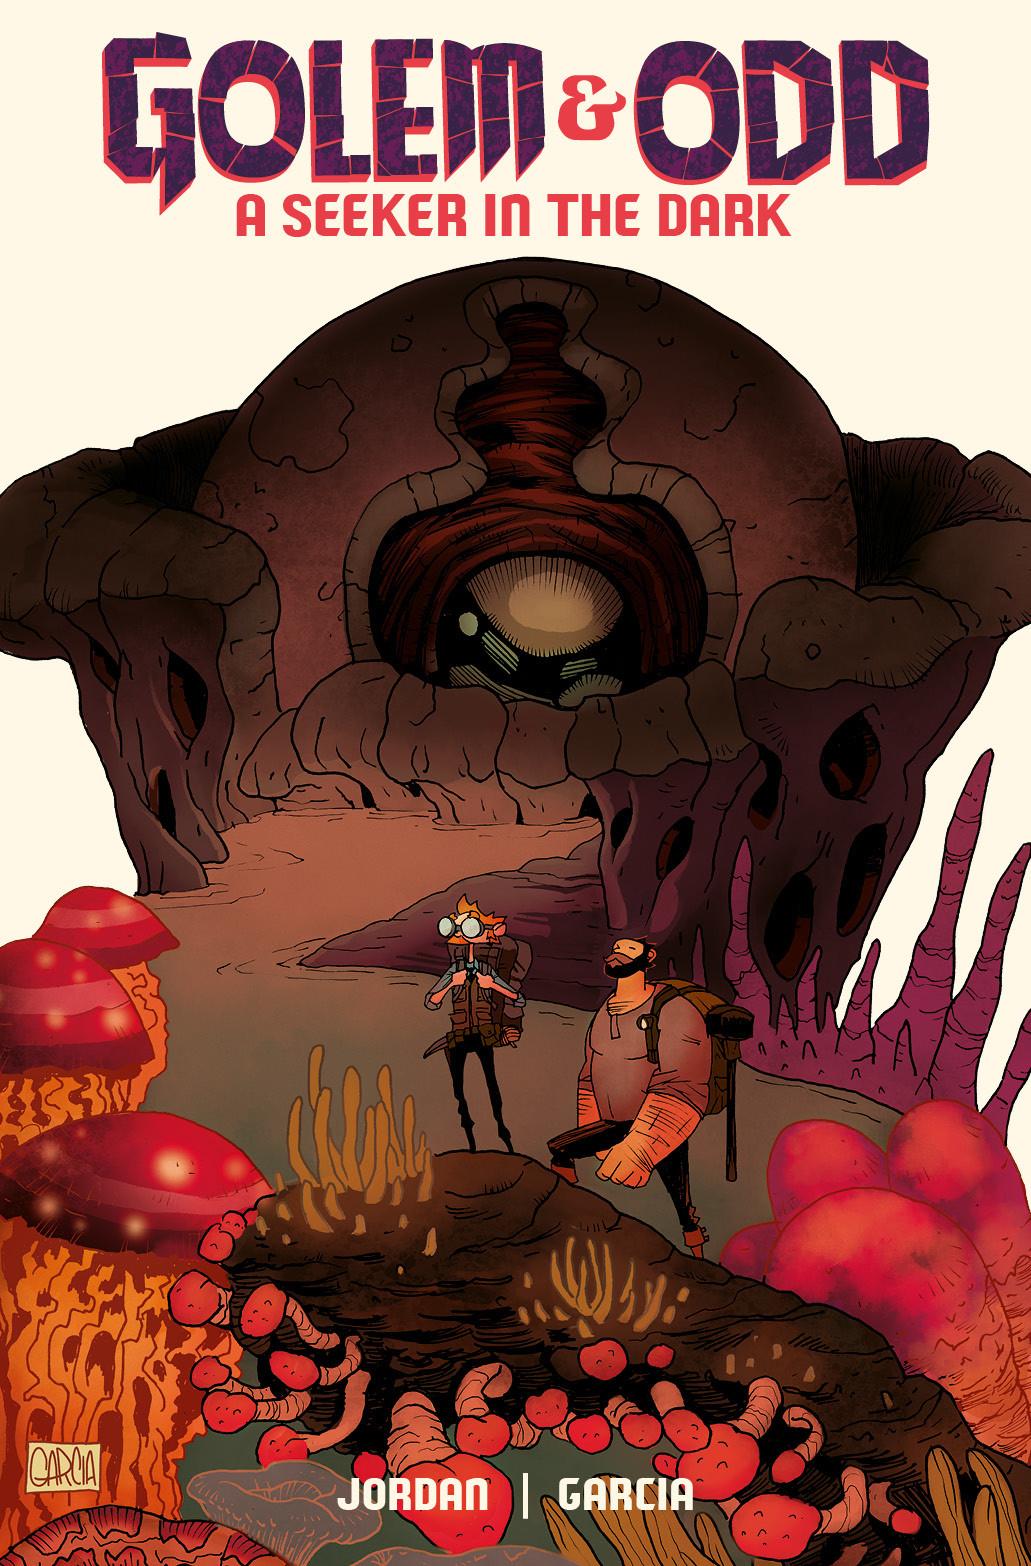 Chaim garcia golem and odd a seeker in the dark1